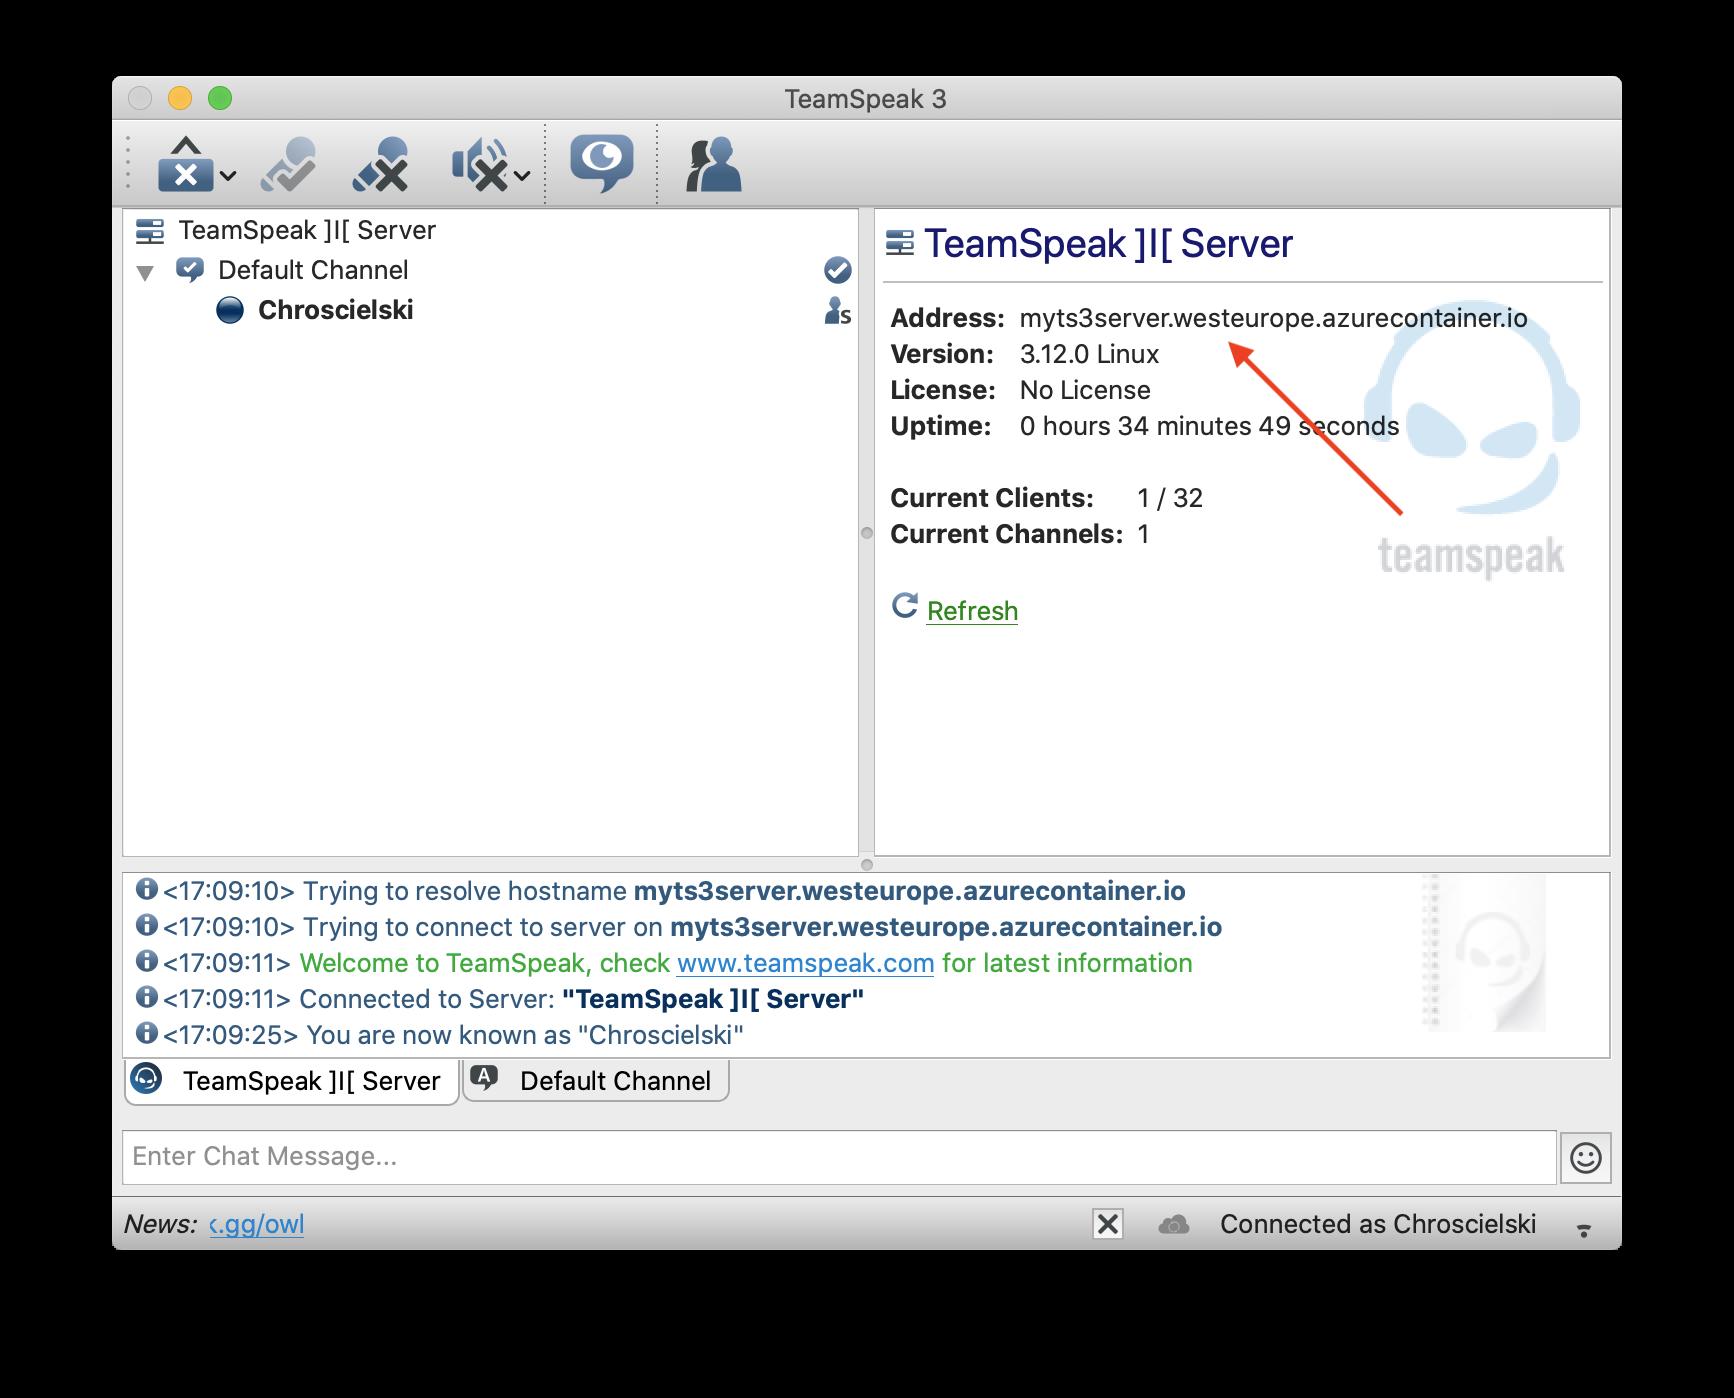 TeamSpeak 3 client window